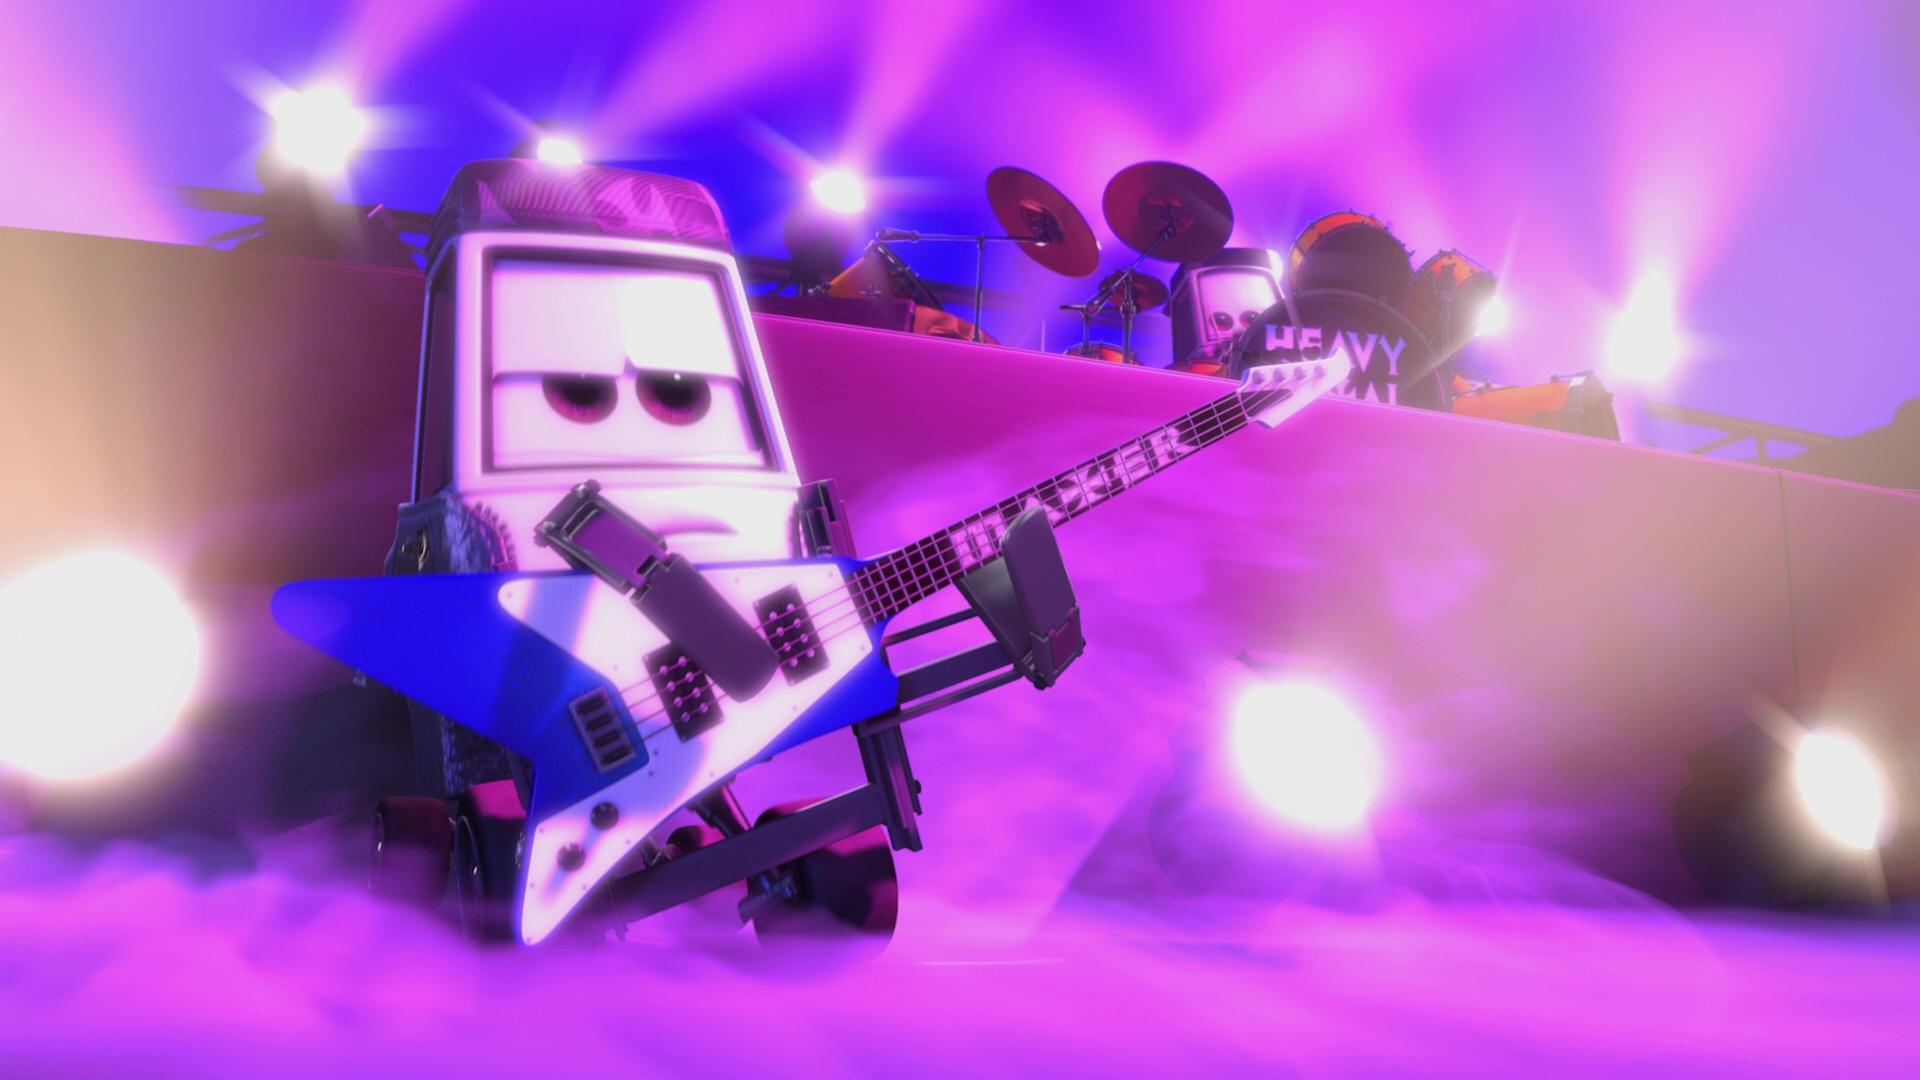 eddie-cars-toon-heavy-metal-martin-03